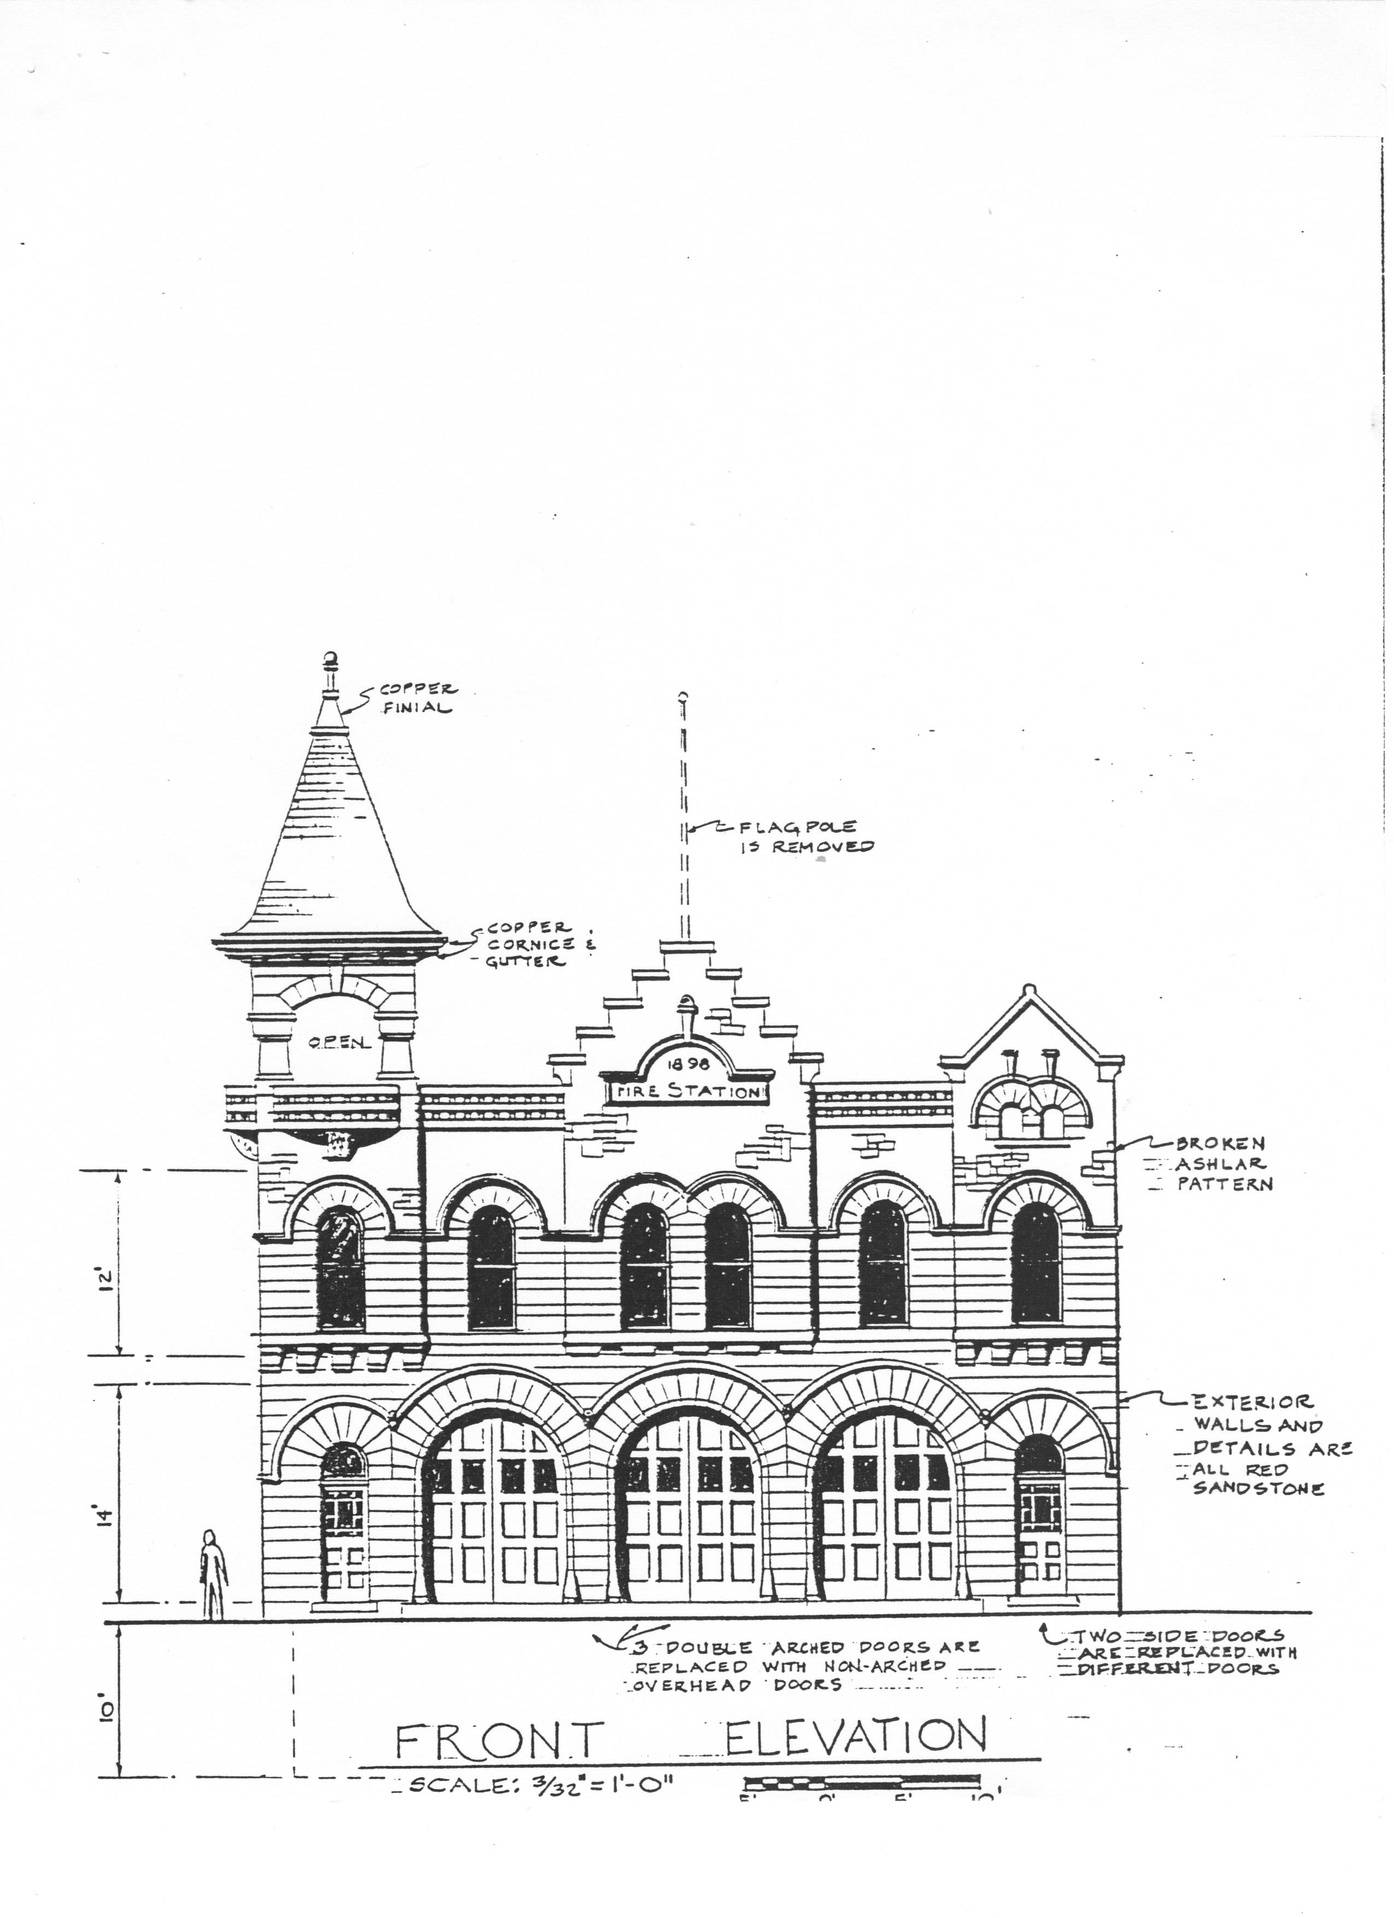 Copy of original blue print for the Fire Station.